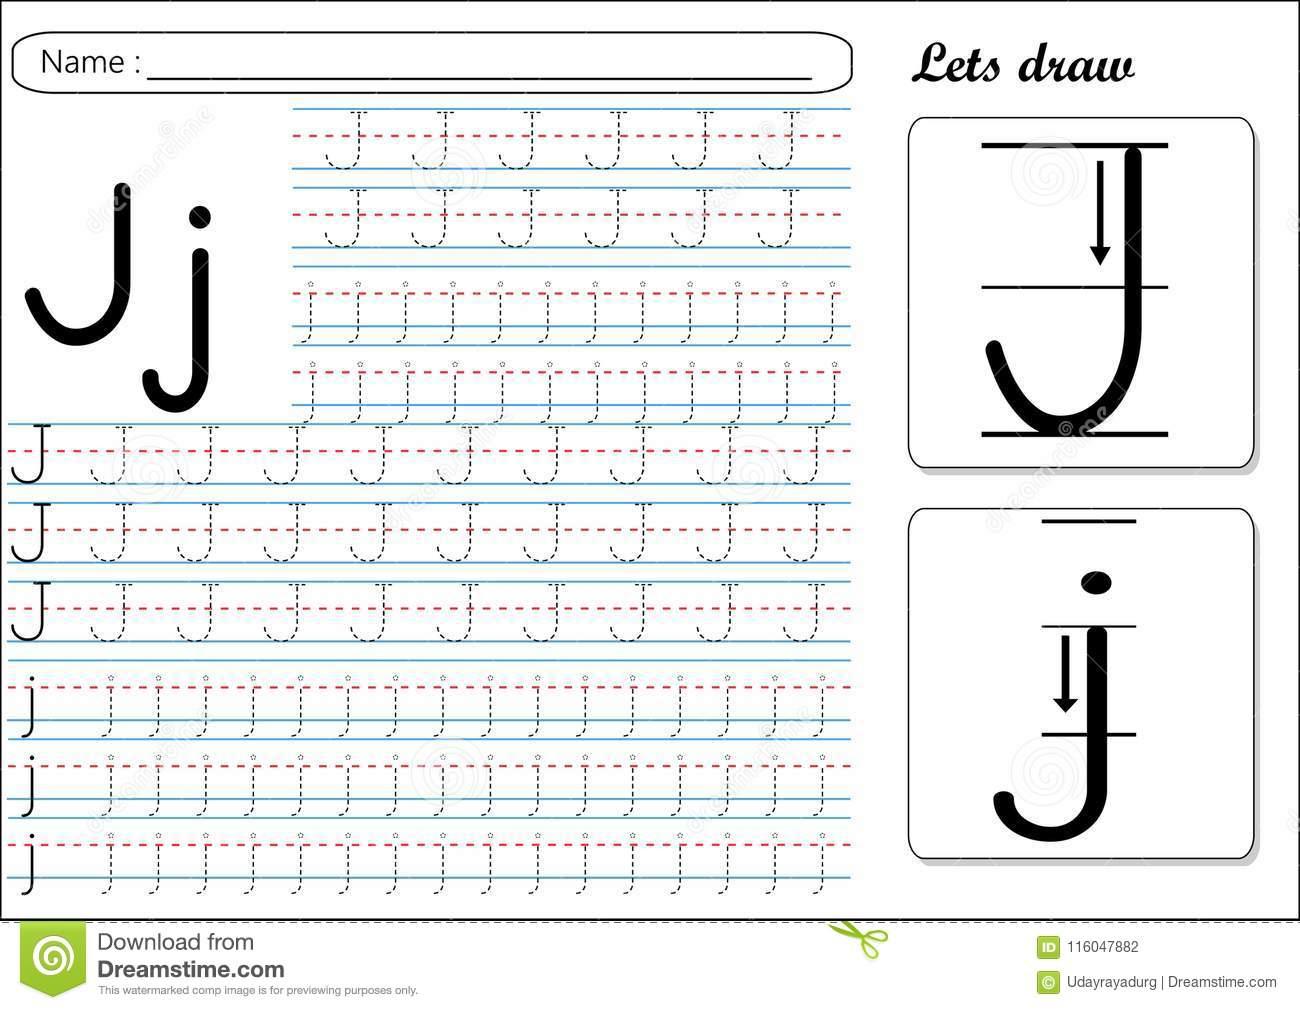 Tracing Worksheet -Jj Stock Vector. Illustration Of English regarding J Letter Tracing